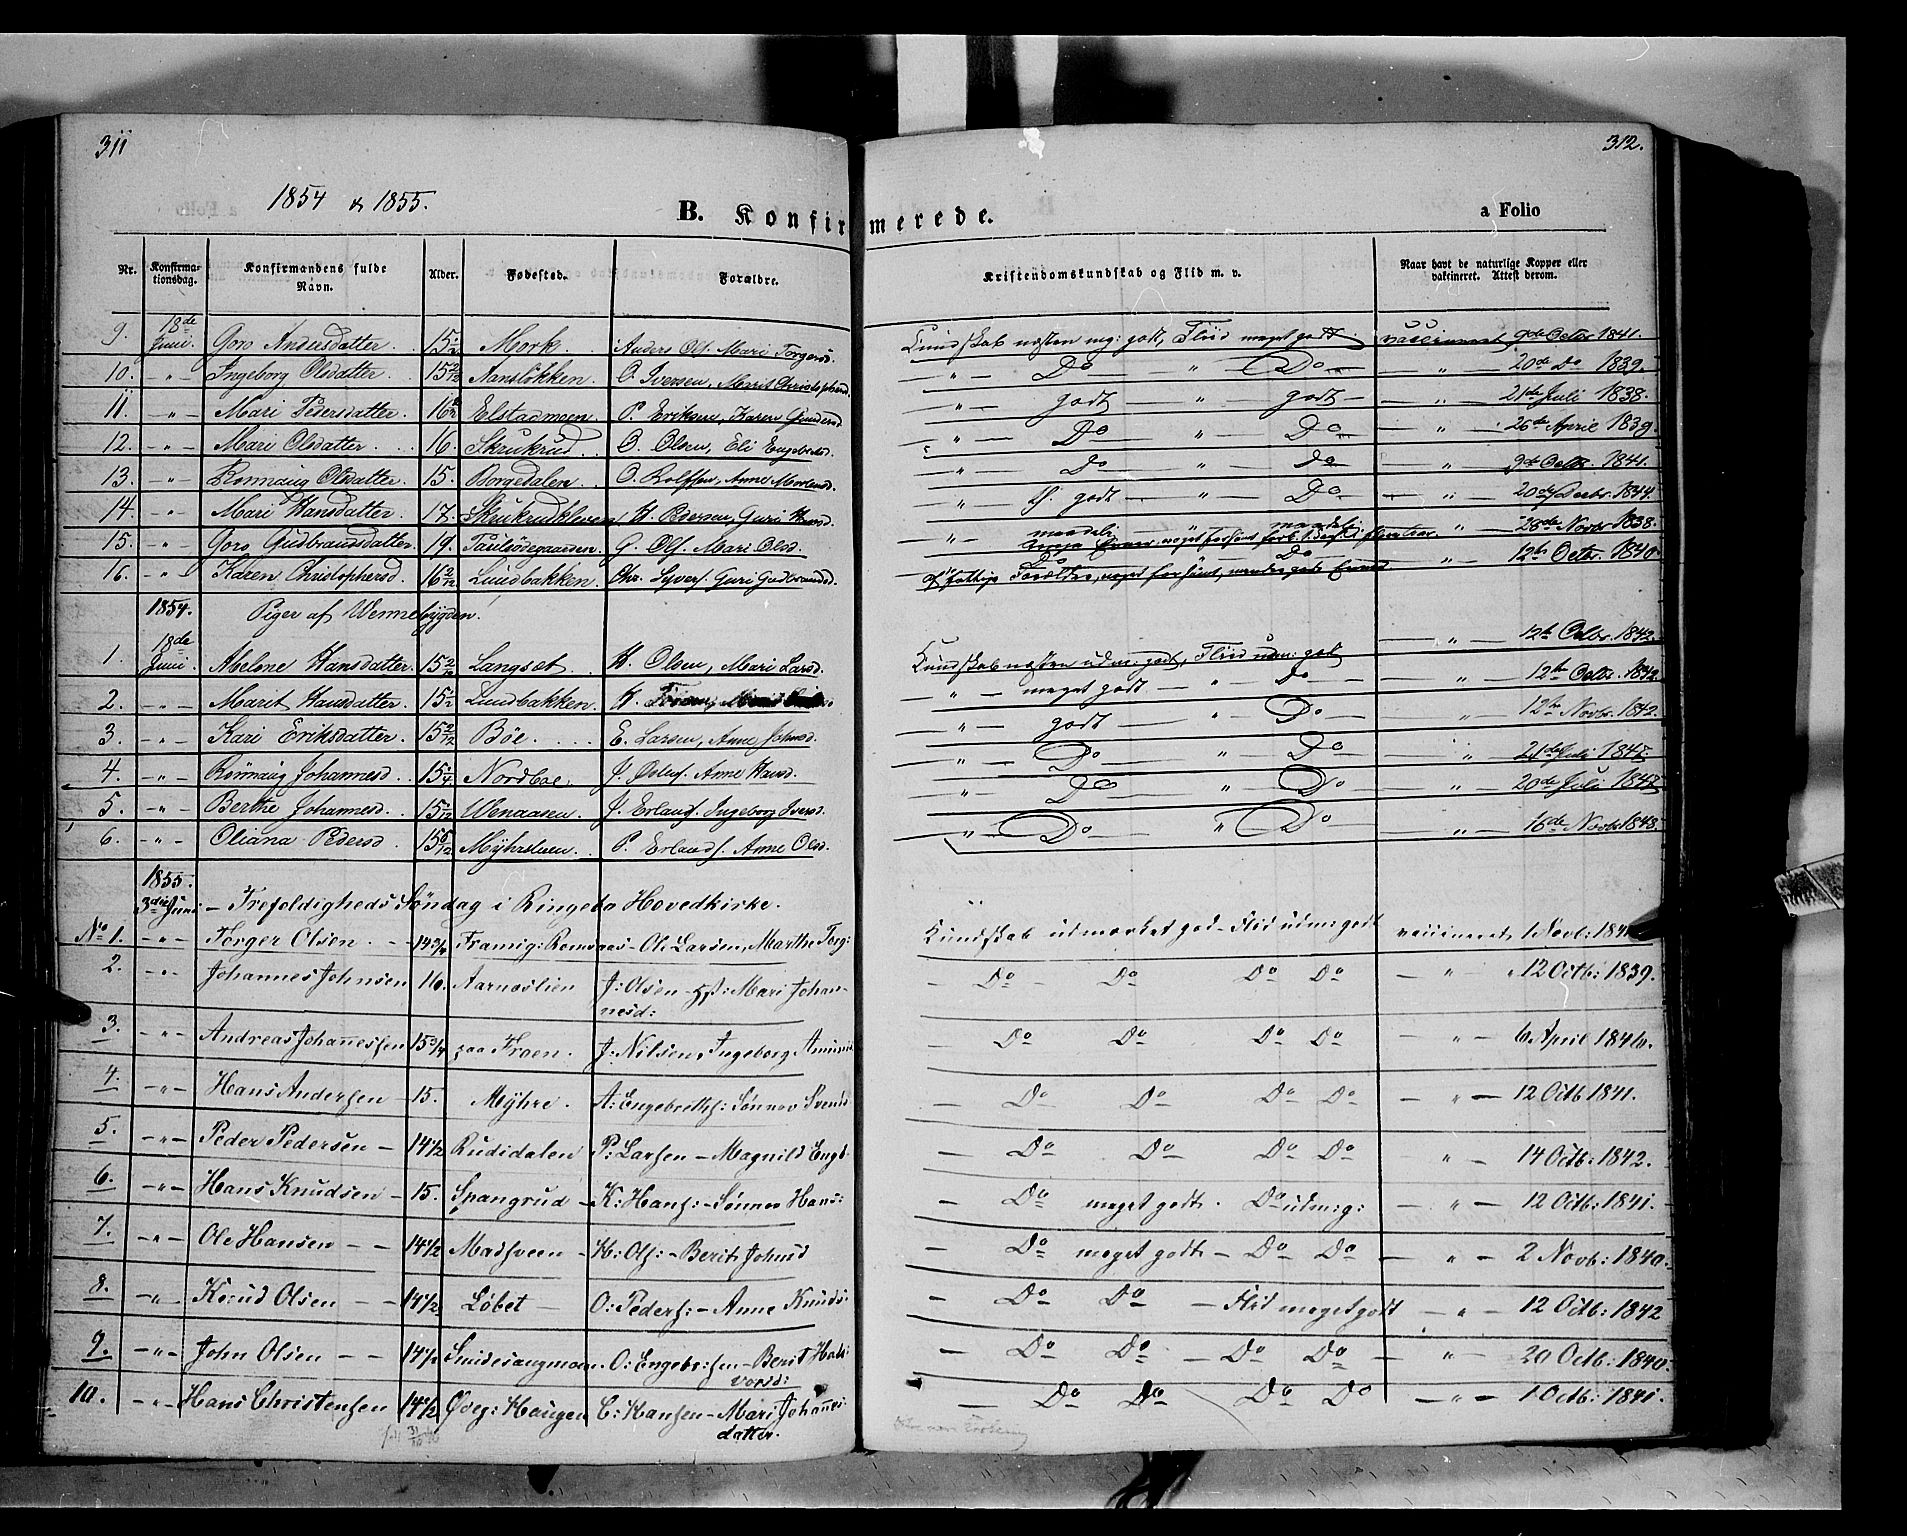 SAH, Ringebu prestekontor, Ministerialbok nr. 6, 1848-1859, s. 311-312